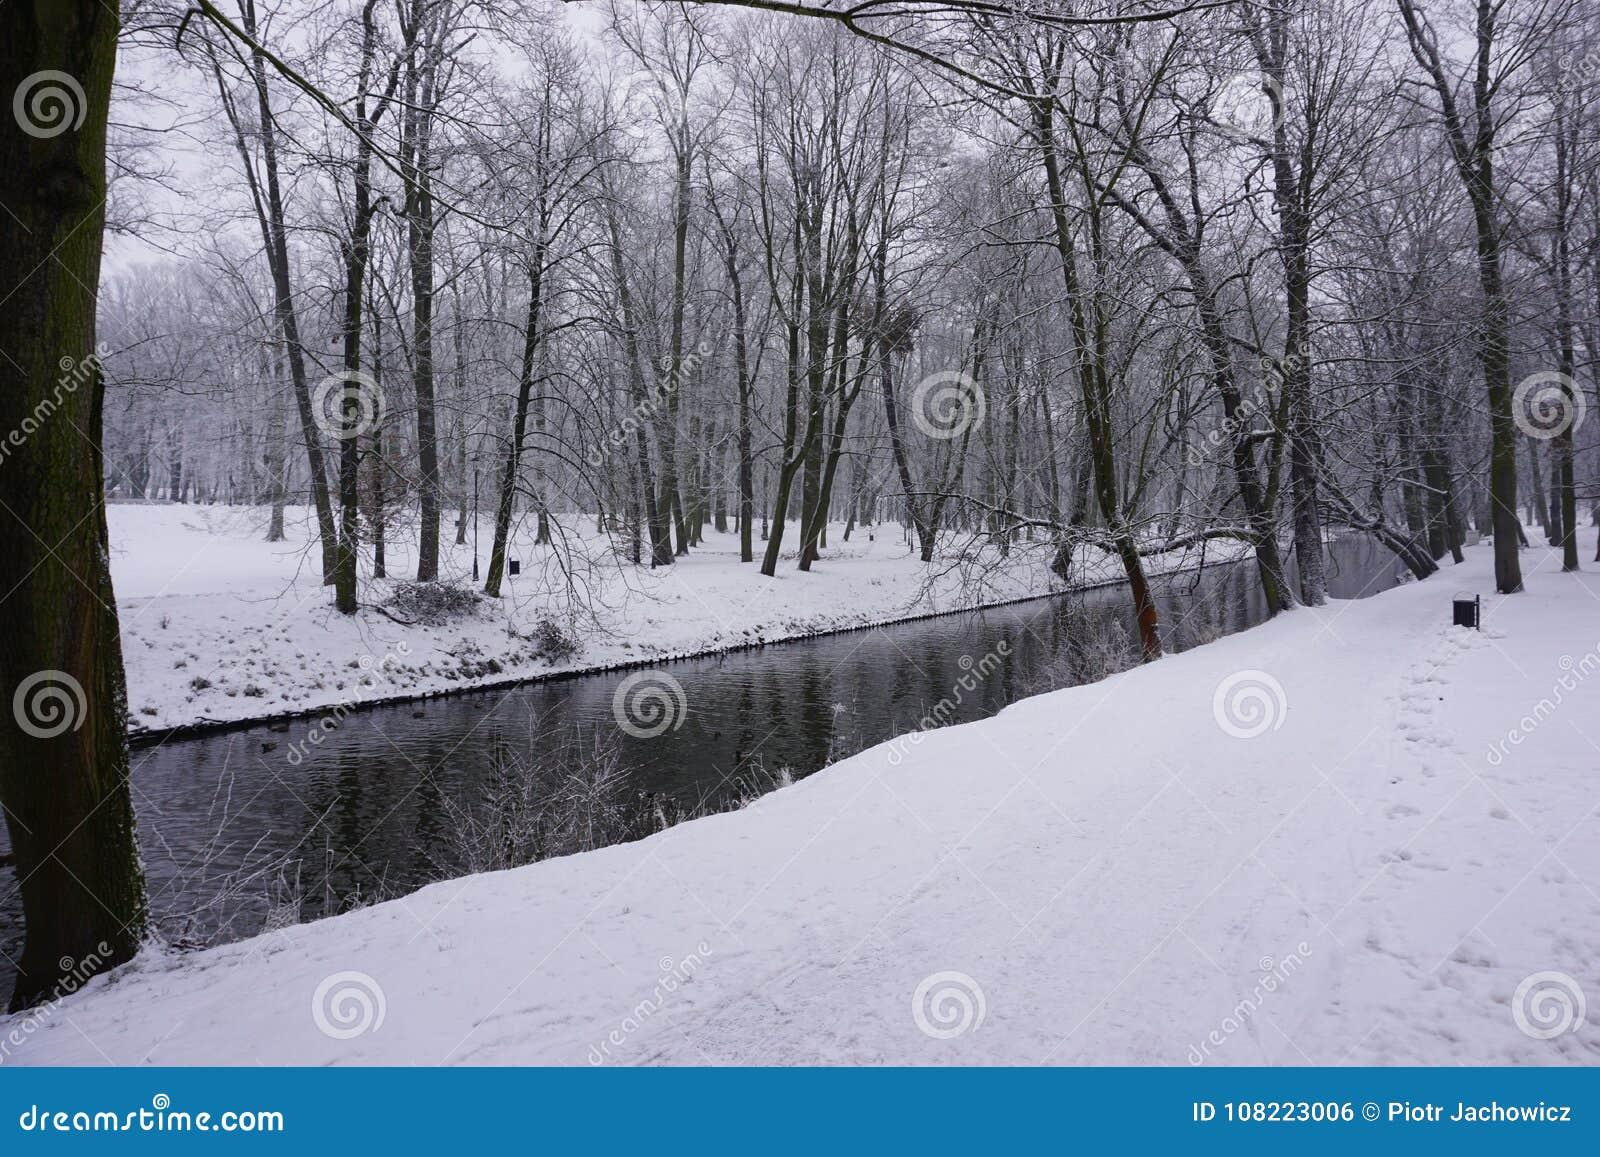 Winter in Park 3